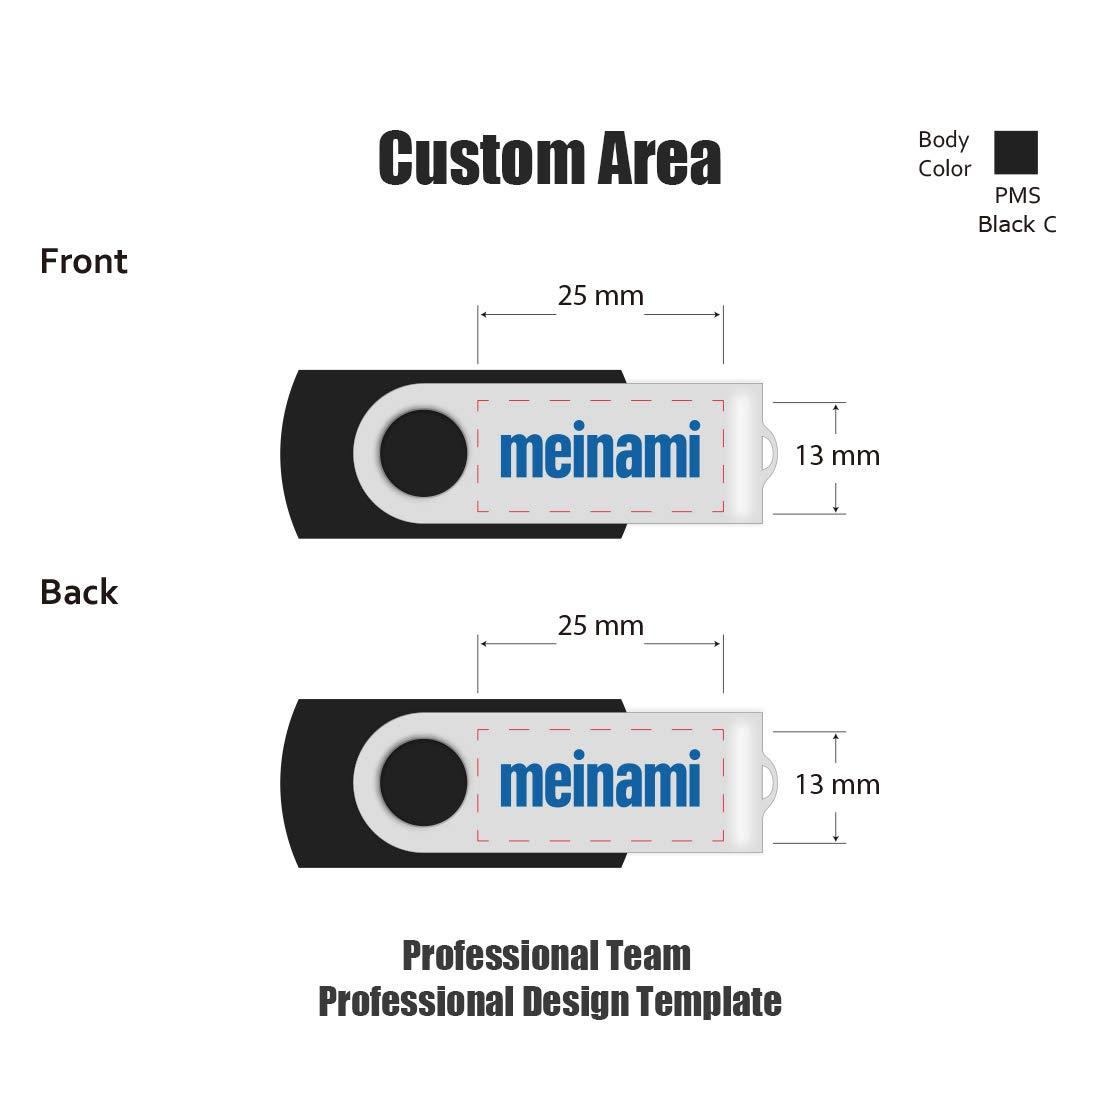 100 Pack 4GB USB Flash Drive Custom USB Thumb Drive Promotional Memory Stick Personalized Logo Jump Drive Twister Swivel Design in Bulk - PMS by MEINAMI (Image #4)